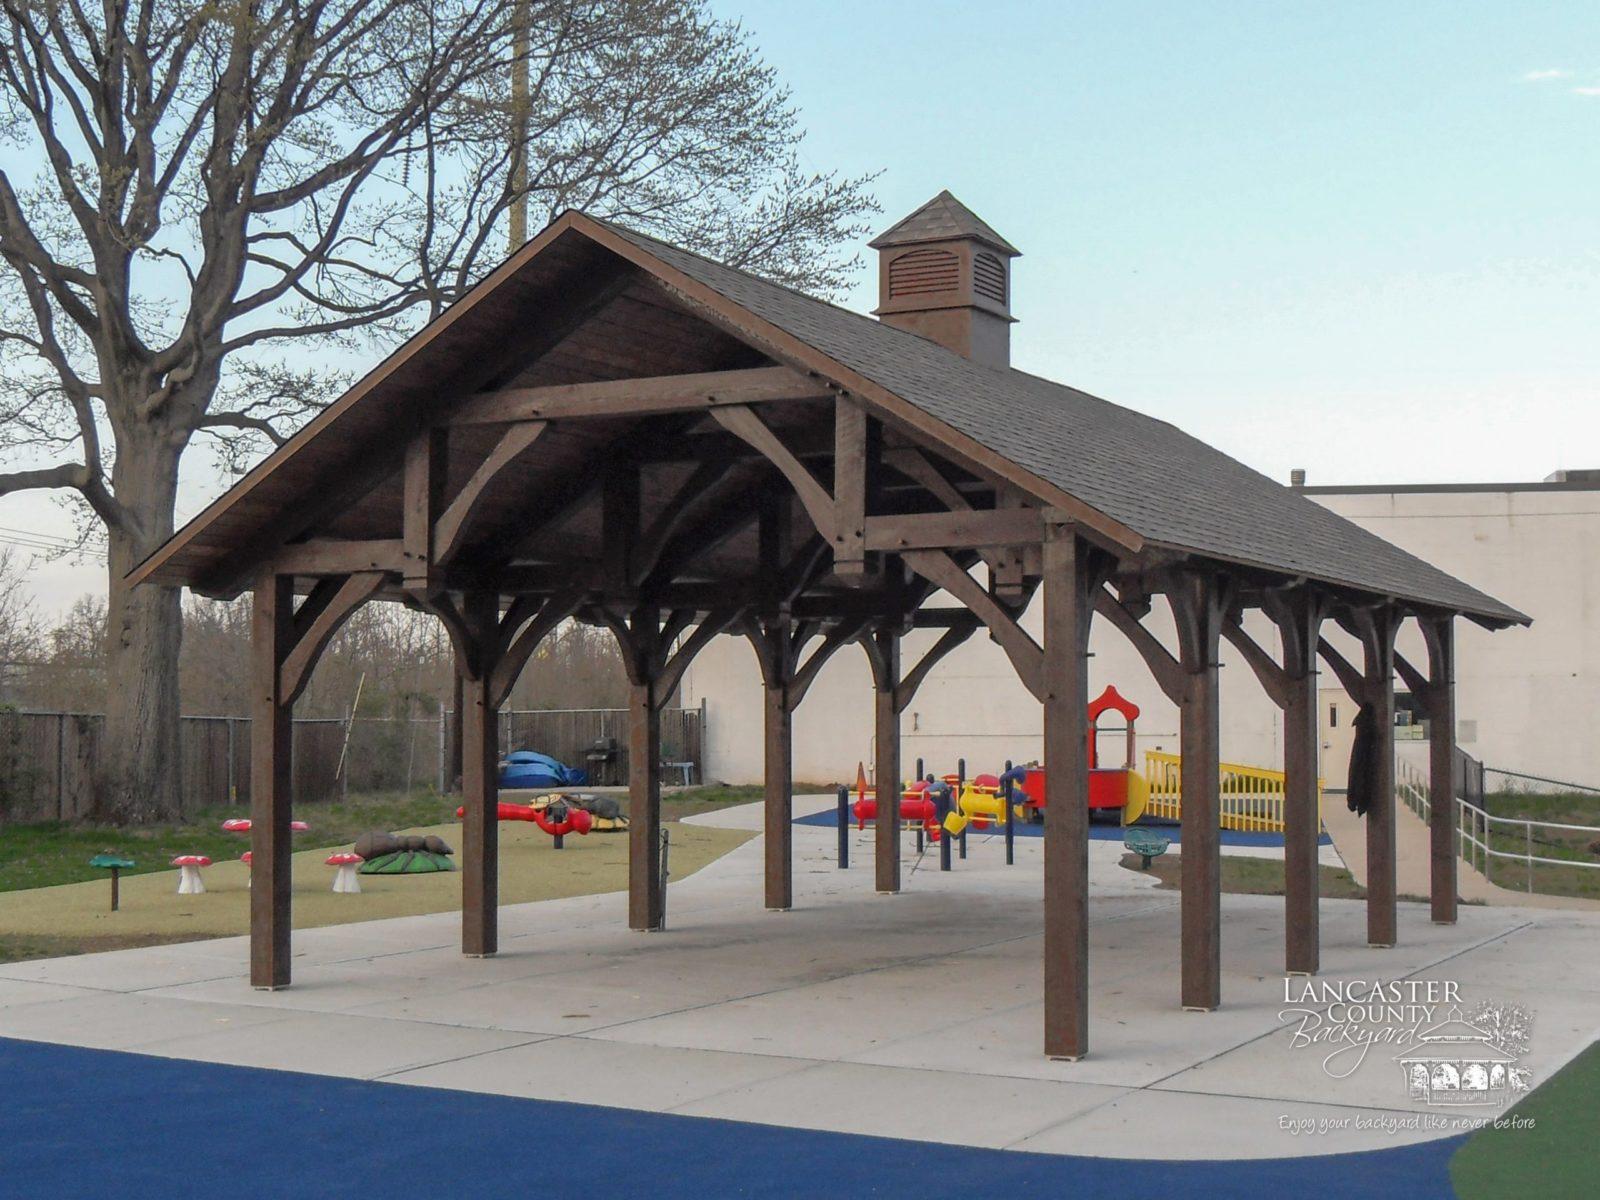 20x32 denali timber frame pavilion